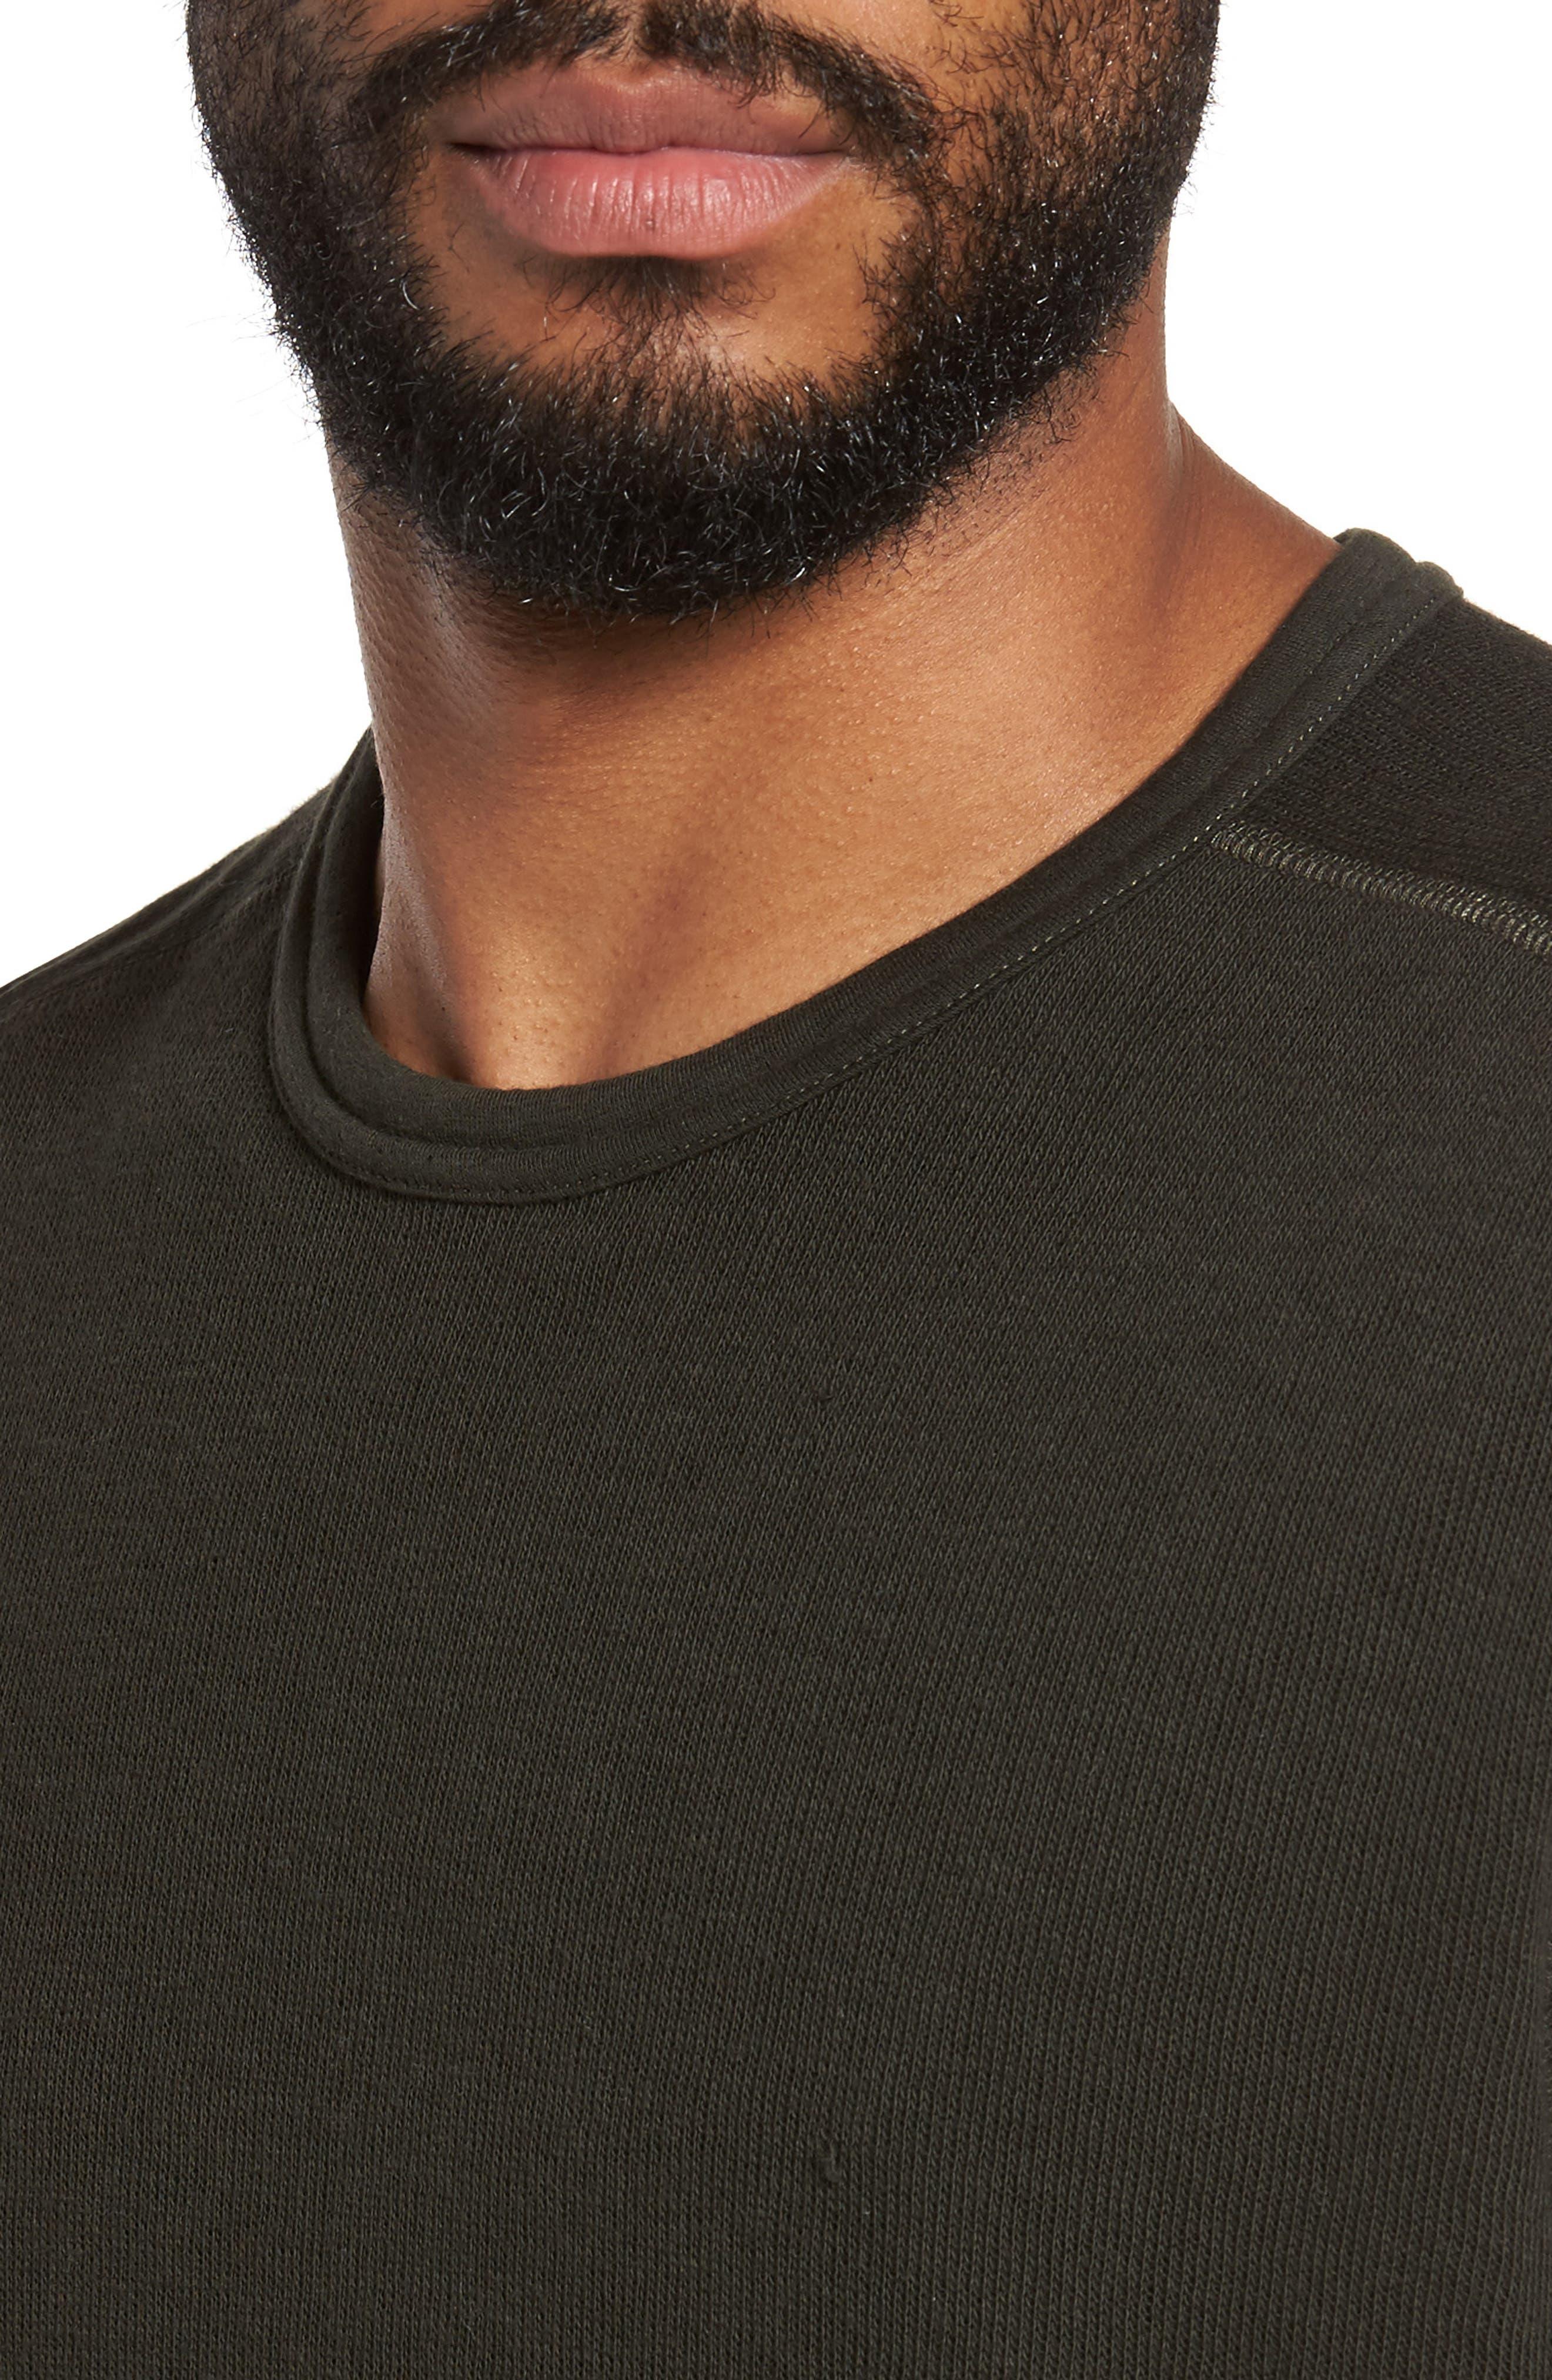 Double Knit Long Sleeve T-Shirt,                             Alternate thumbnail 19, color,